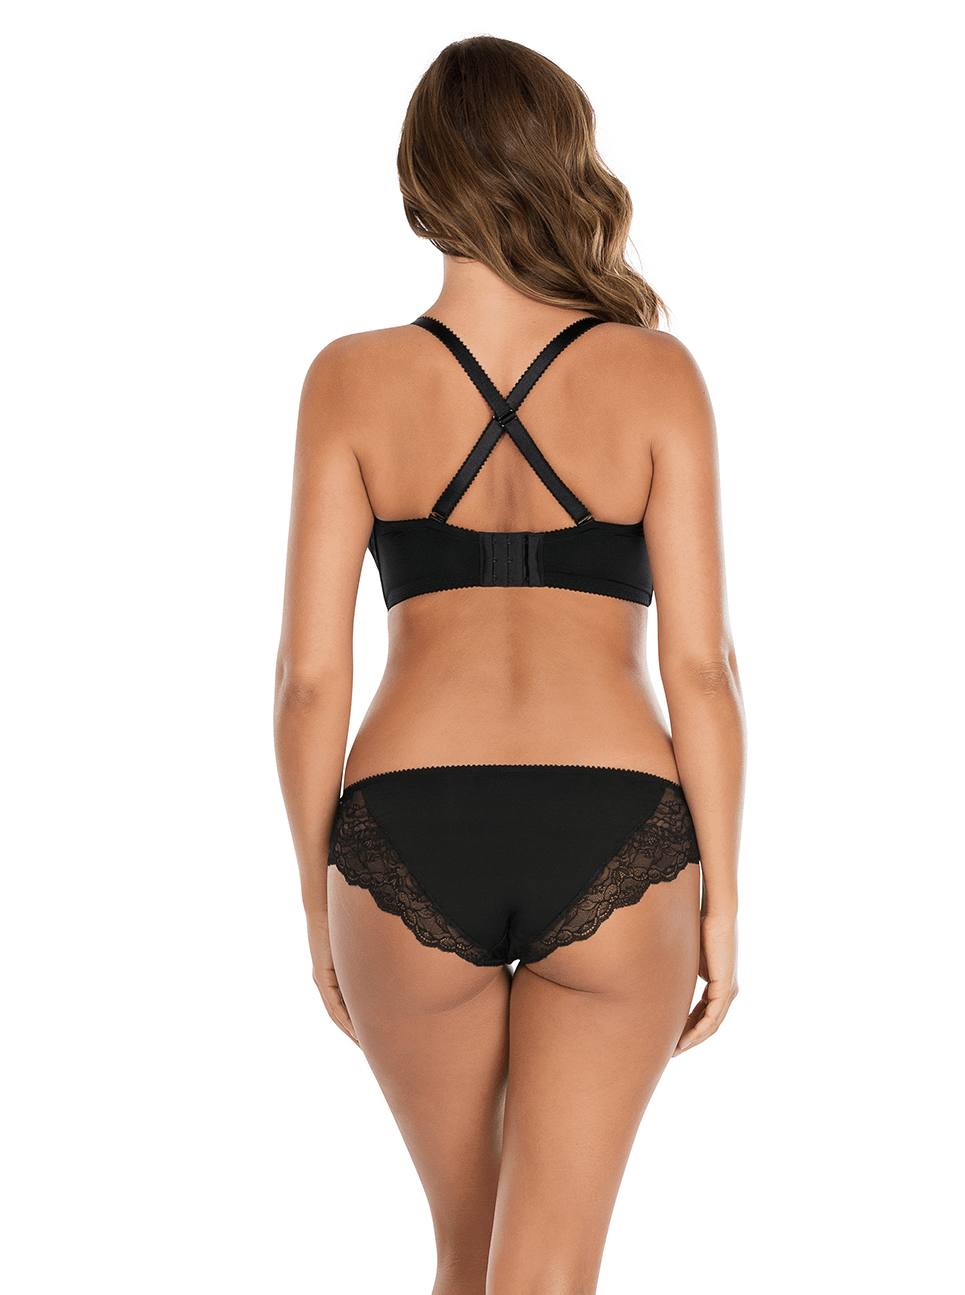 Elissa ContourUnderwireBraP5011 BikiniP5013 Black Cross Back - Elissa Strapless Bra Black P5011